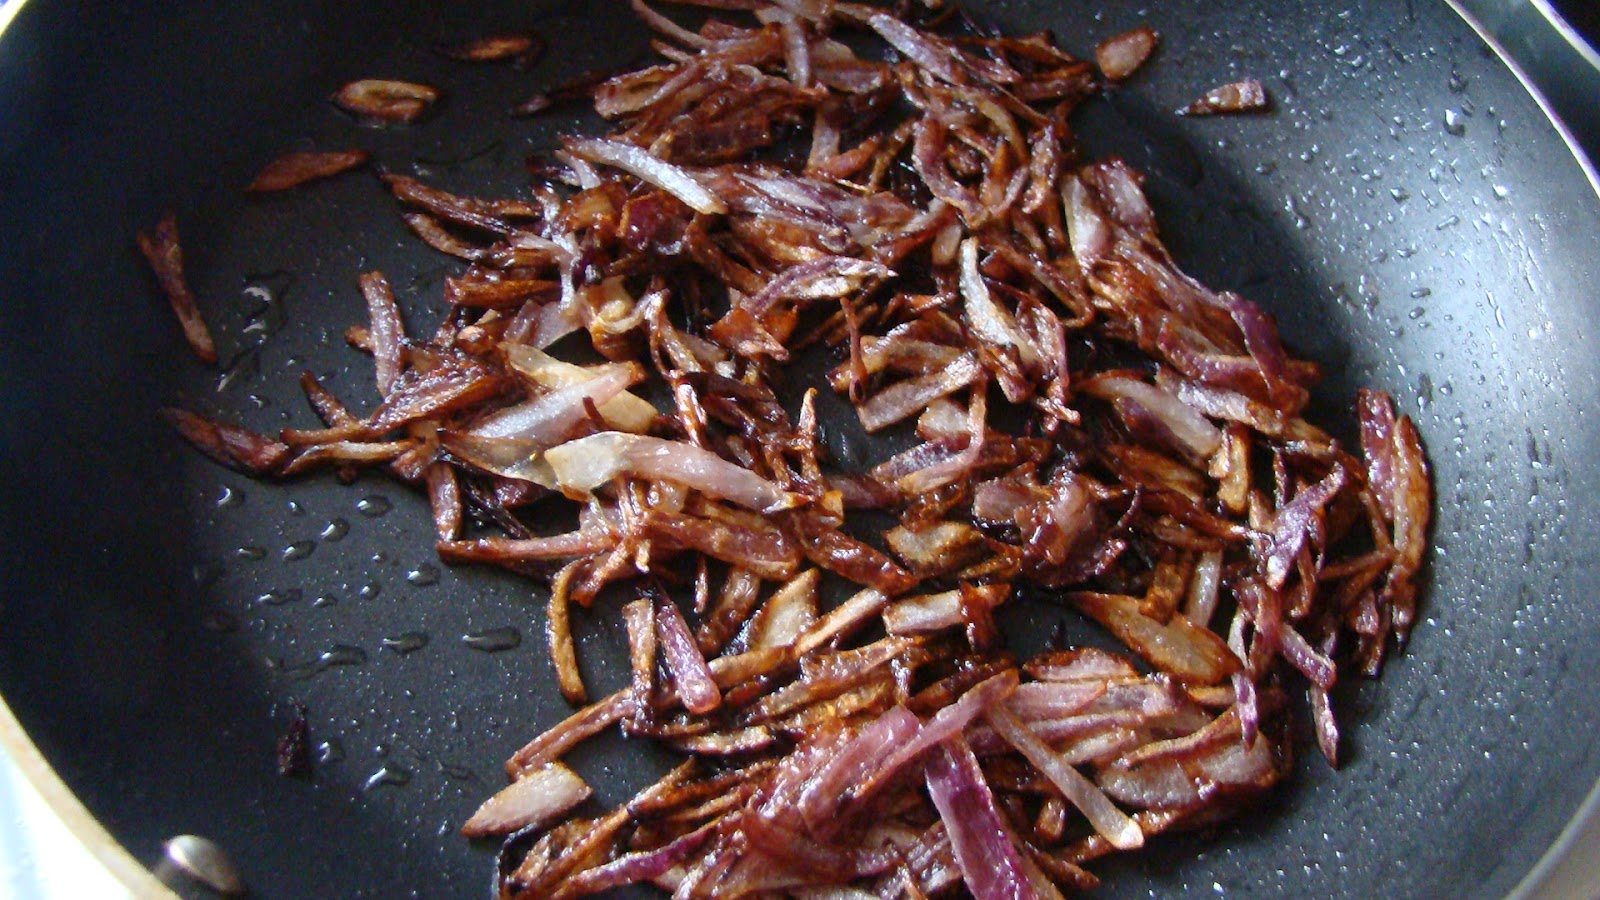 Mana telugu vantillu hyderabadi chicken dum biryani heat oil in a pan and add the sliced onion and deep fry them till it becomes crisp and dark brown forumfinder Images